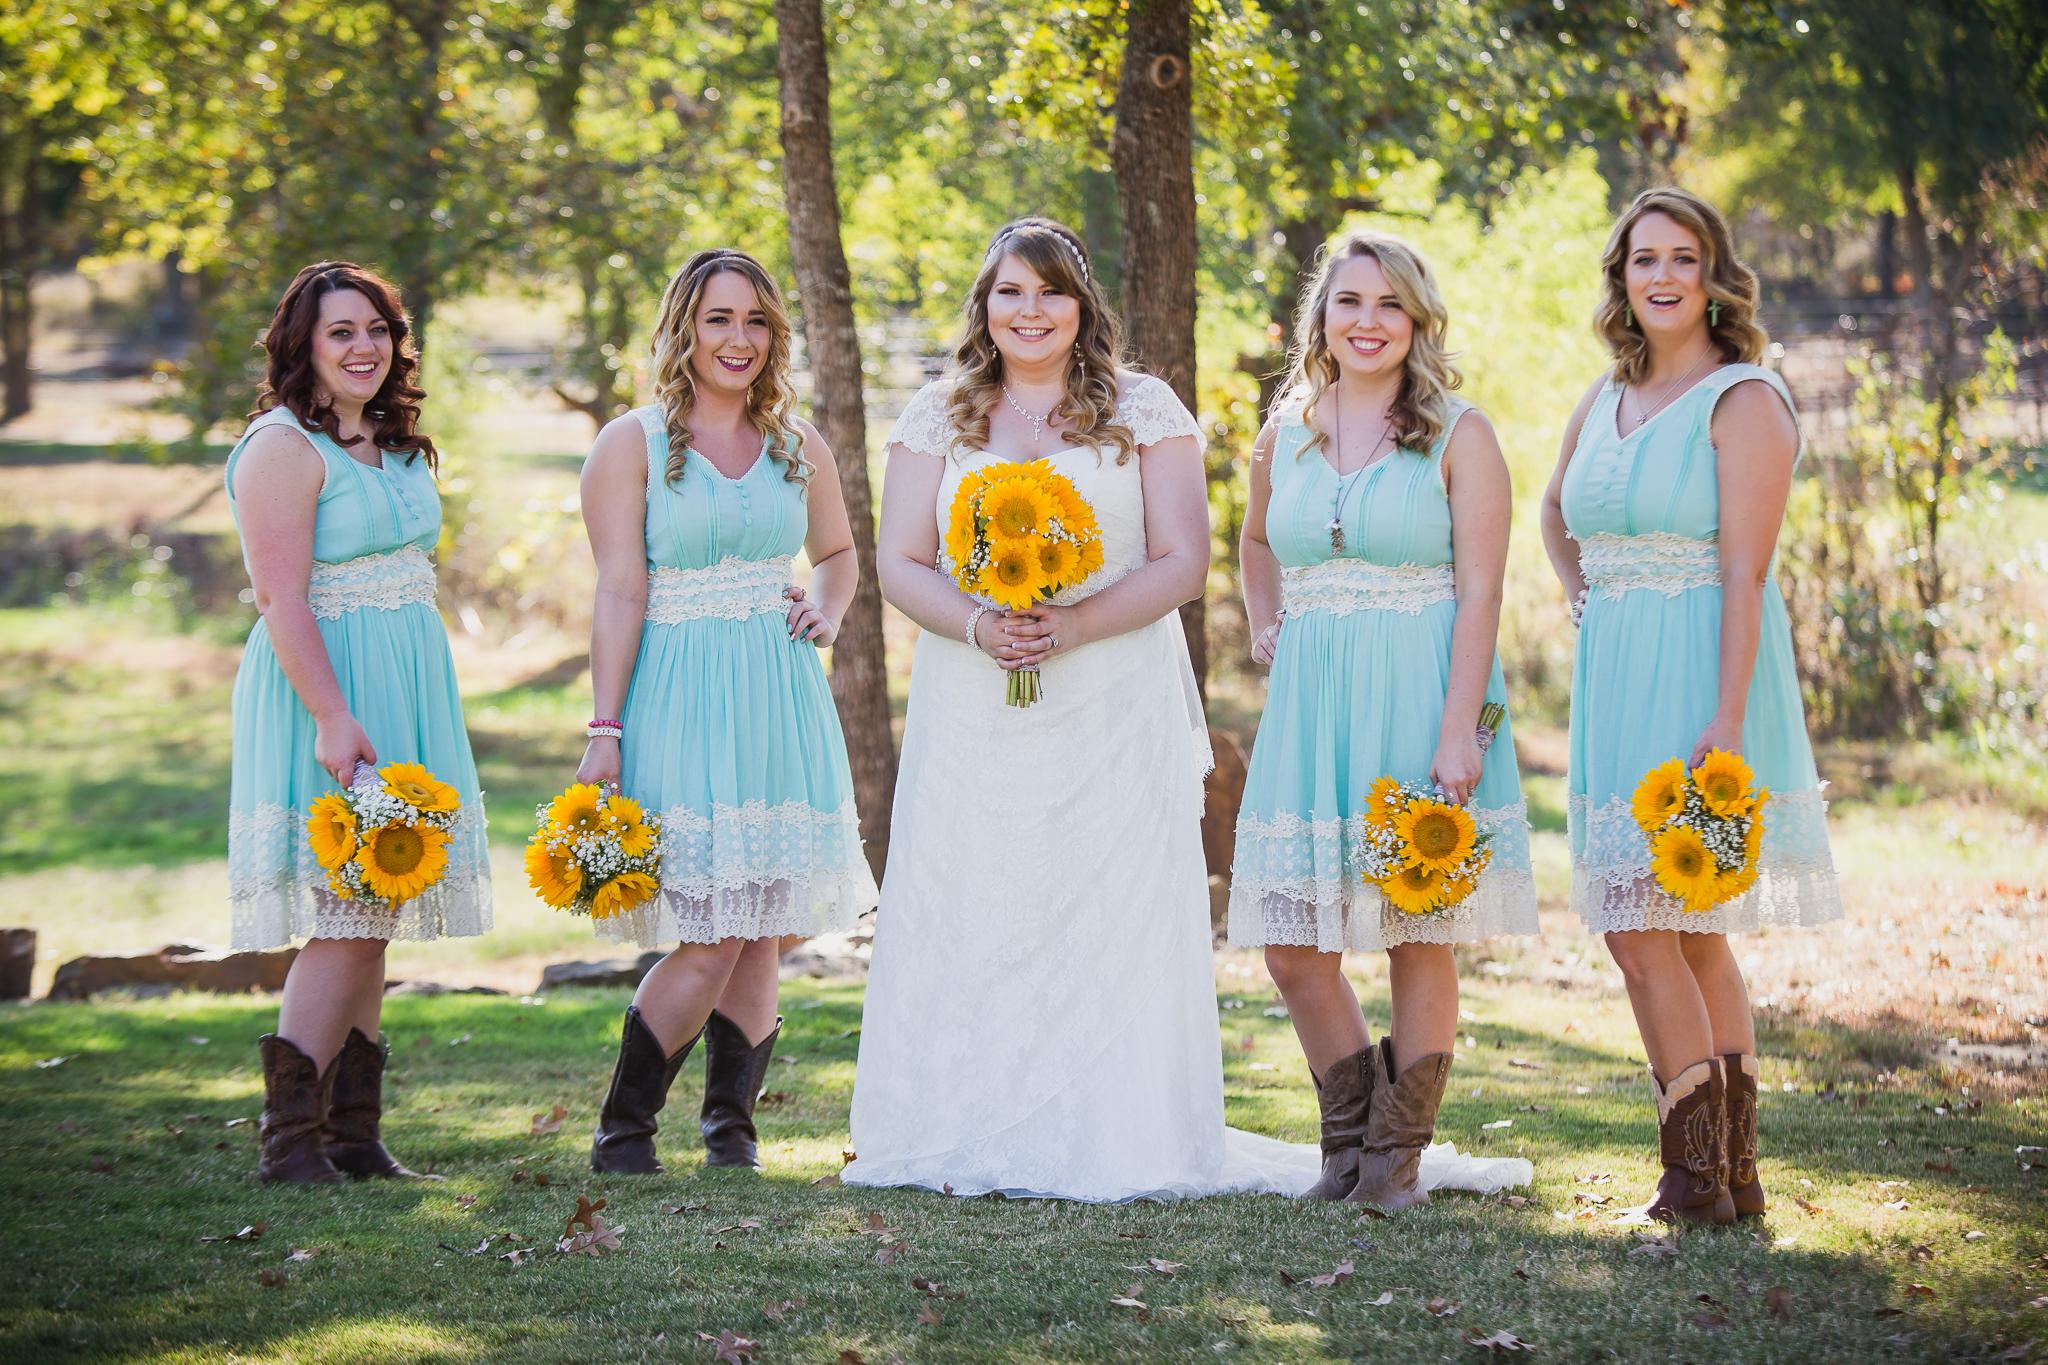 bride and bridesmaids portrait sunflowers